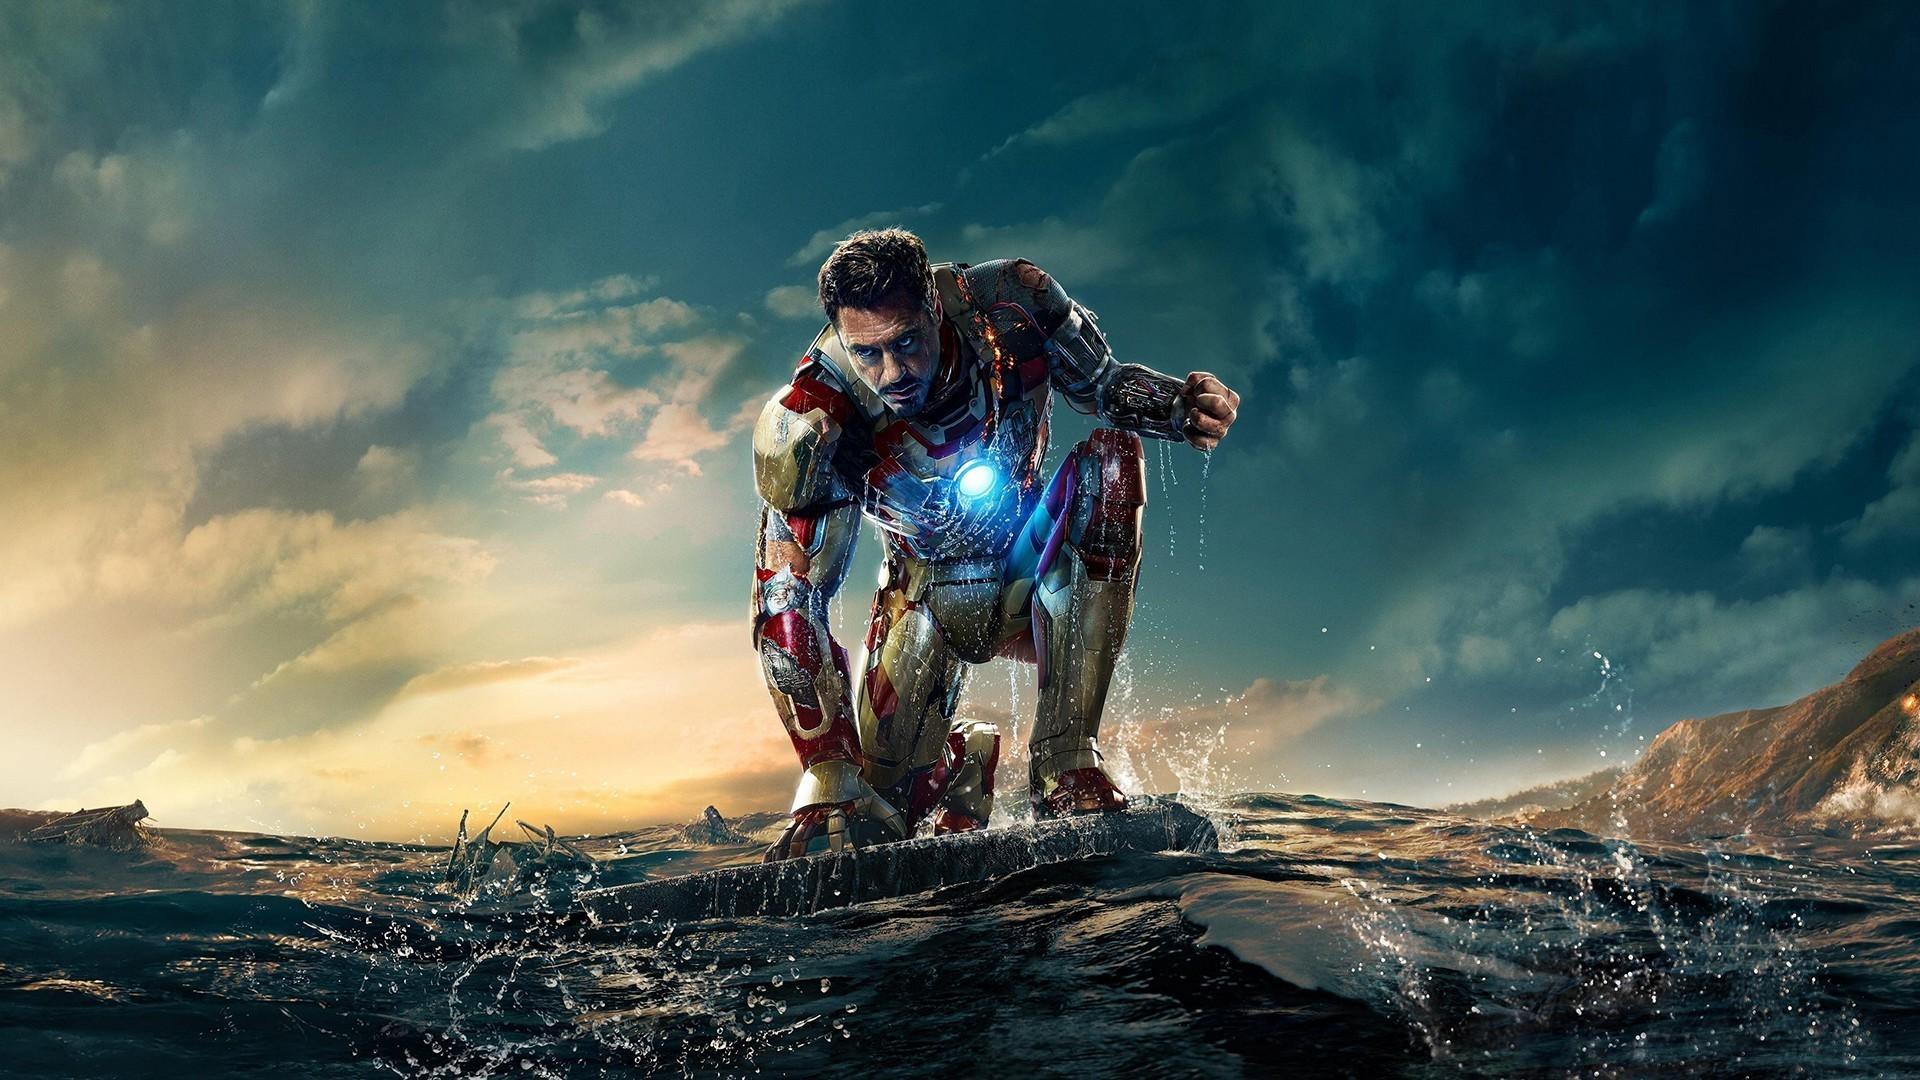 Wallpaper Sea Vehicle Iron Man Iron Man 3 Robert Downey Jr